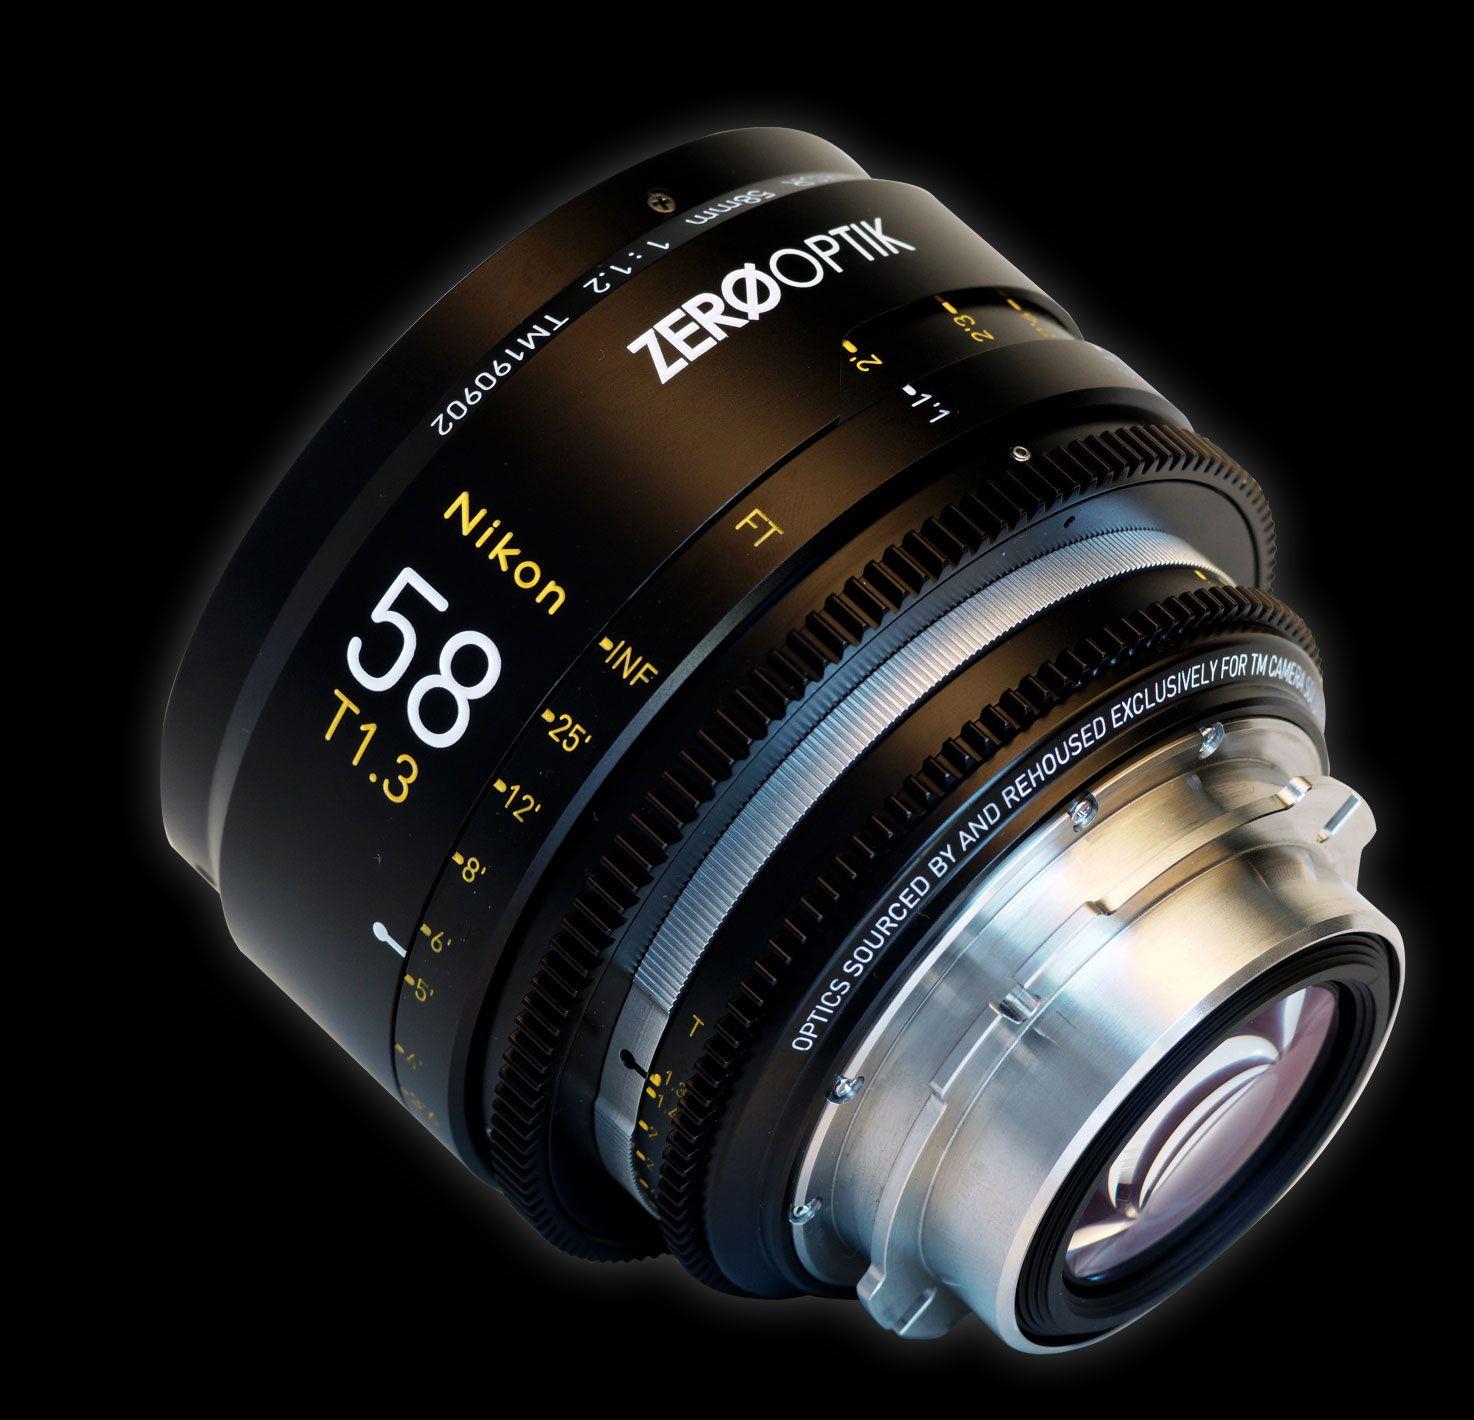 Nikkor Noct 58mm F 1 2 Cf Cinema Lens By Zero Optik Nikon Rumors Dslr Photography Photography Lenses Camera Photography